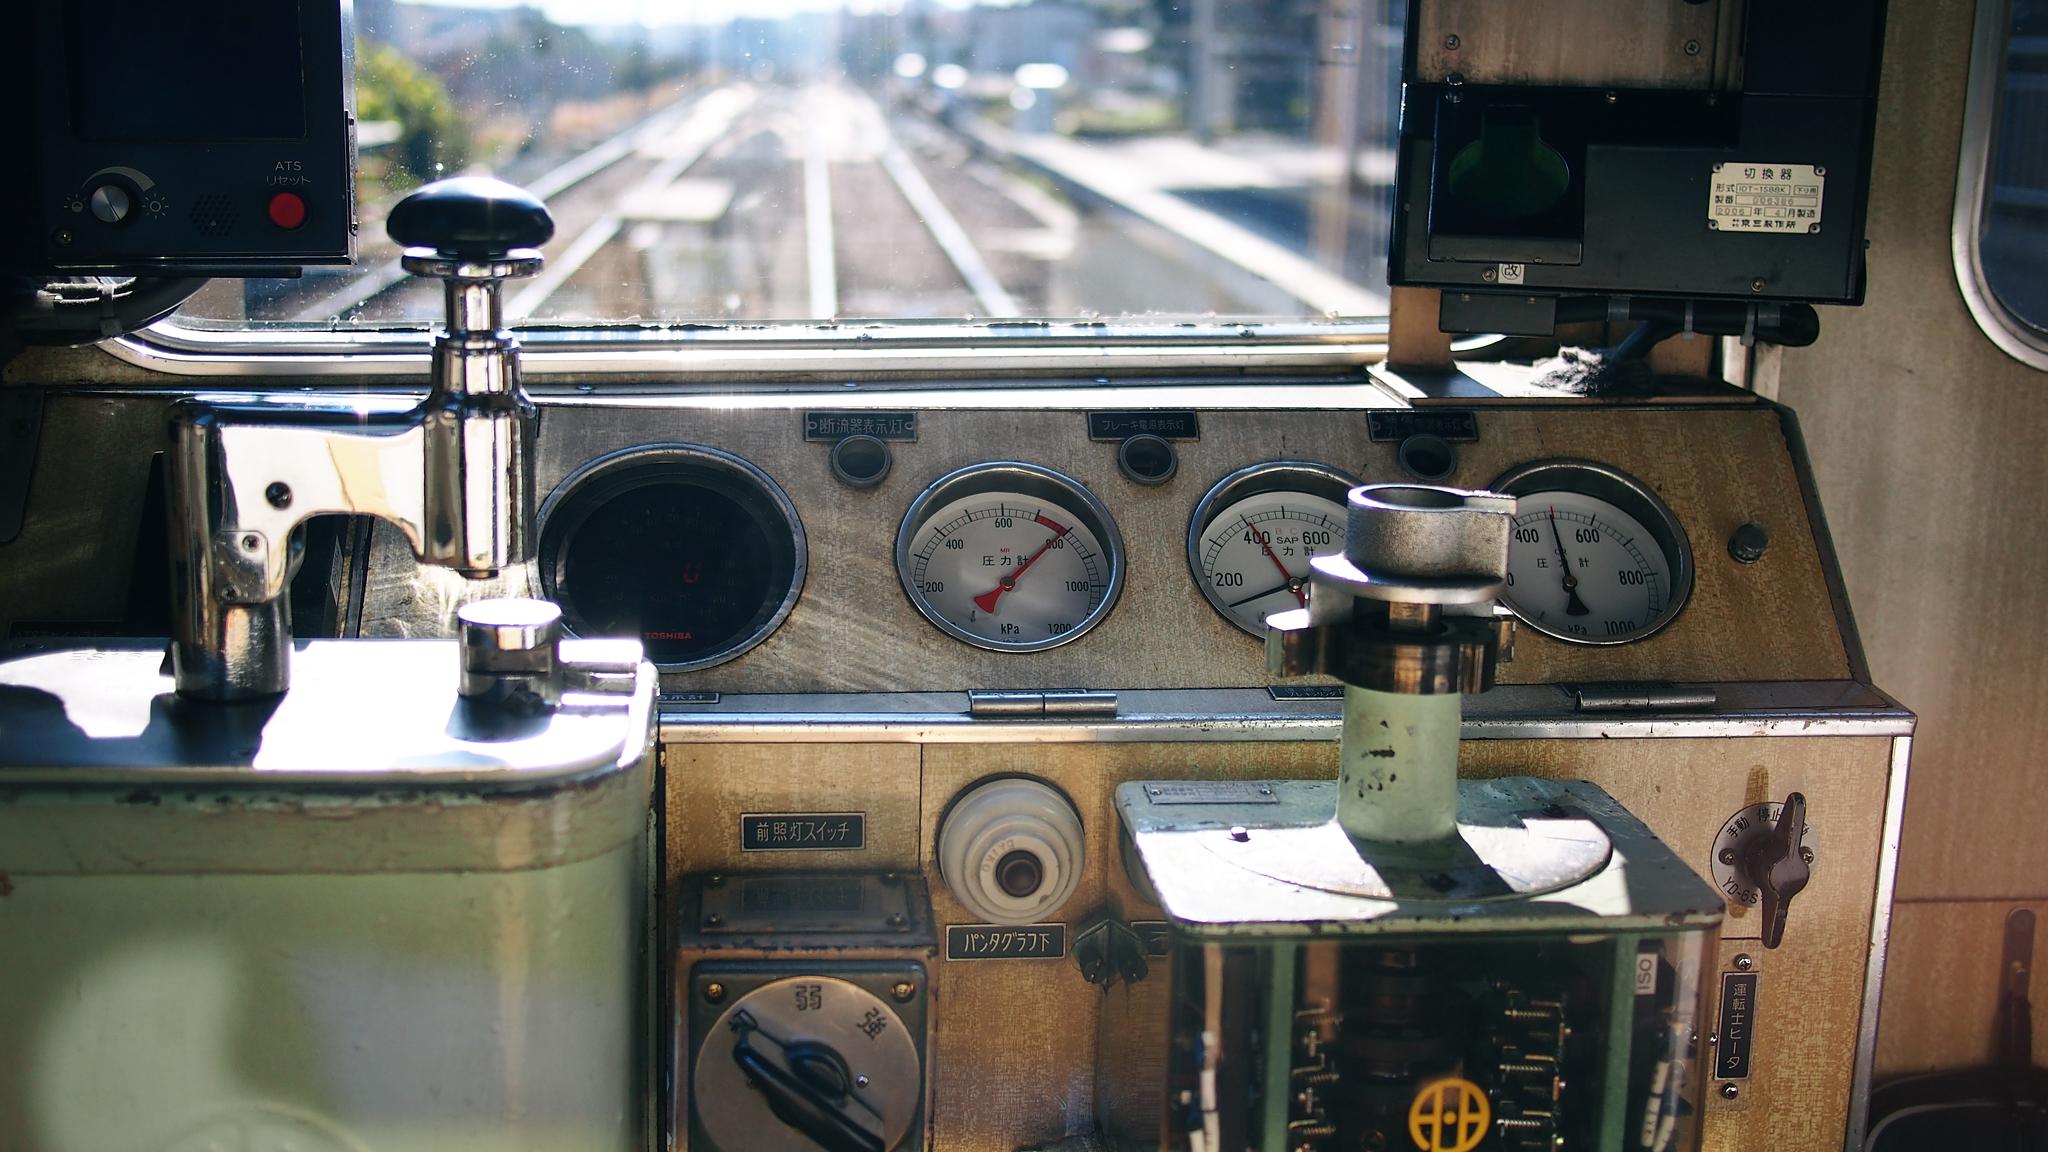 Wallpaper : Japan, city, car, urban, interior, train